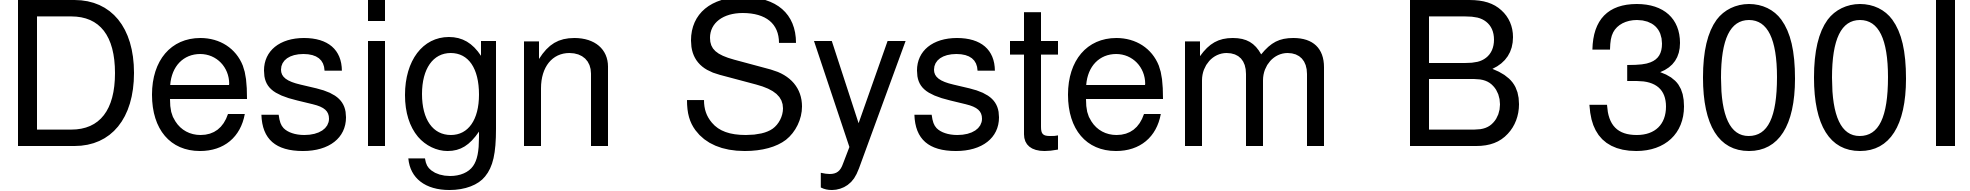 Design System B 300I